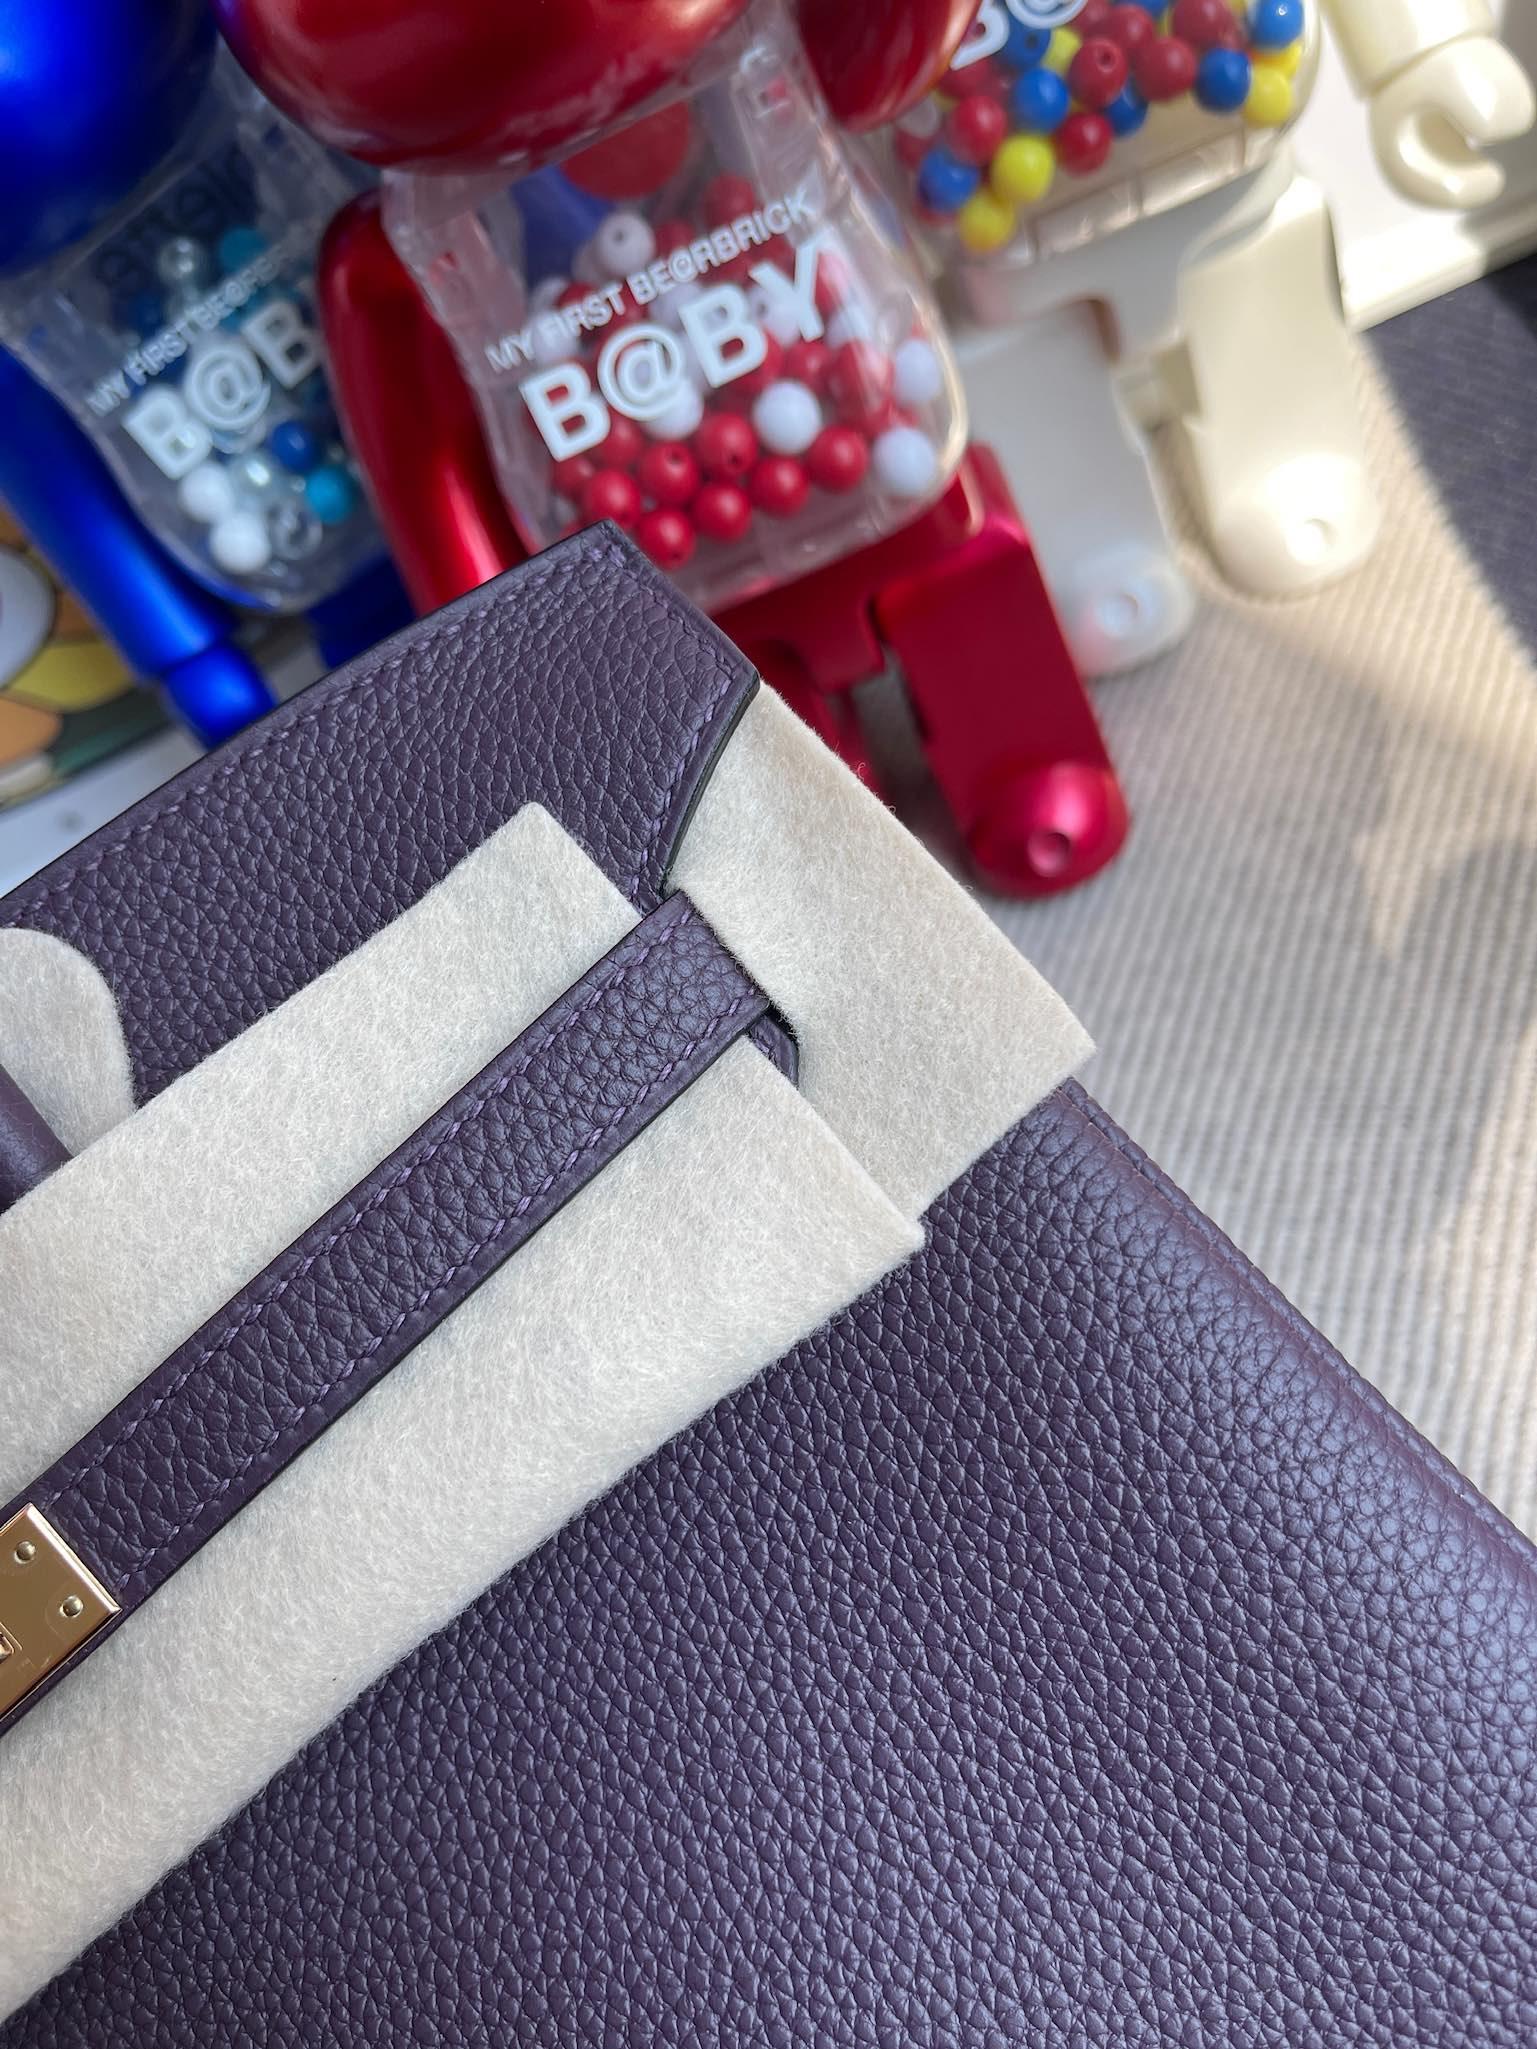 Hermès(爱马仕)Birkin 铂金包 原厂小牛皮 togo 葡萄紫 玫瑰金扣 Rose gold 25cm 顶级手缝